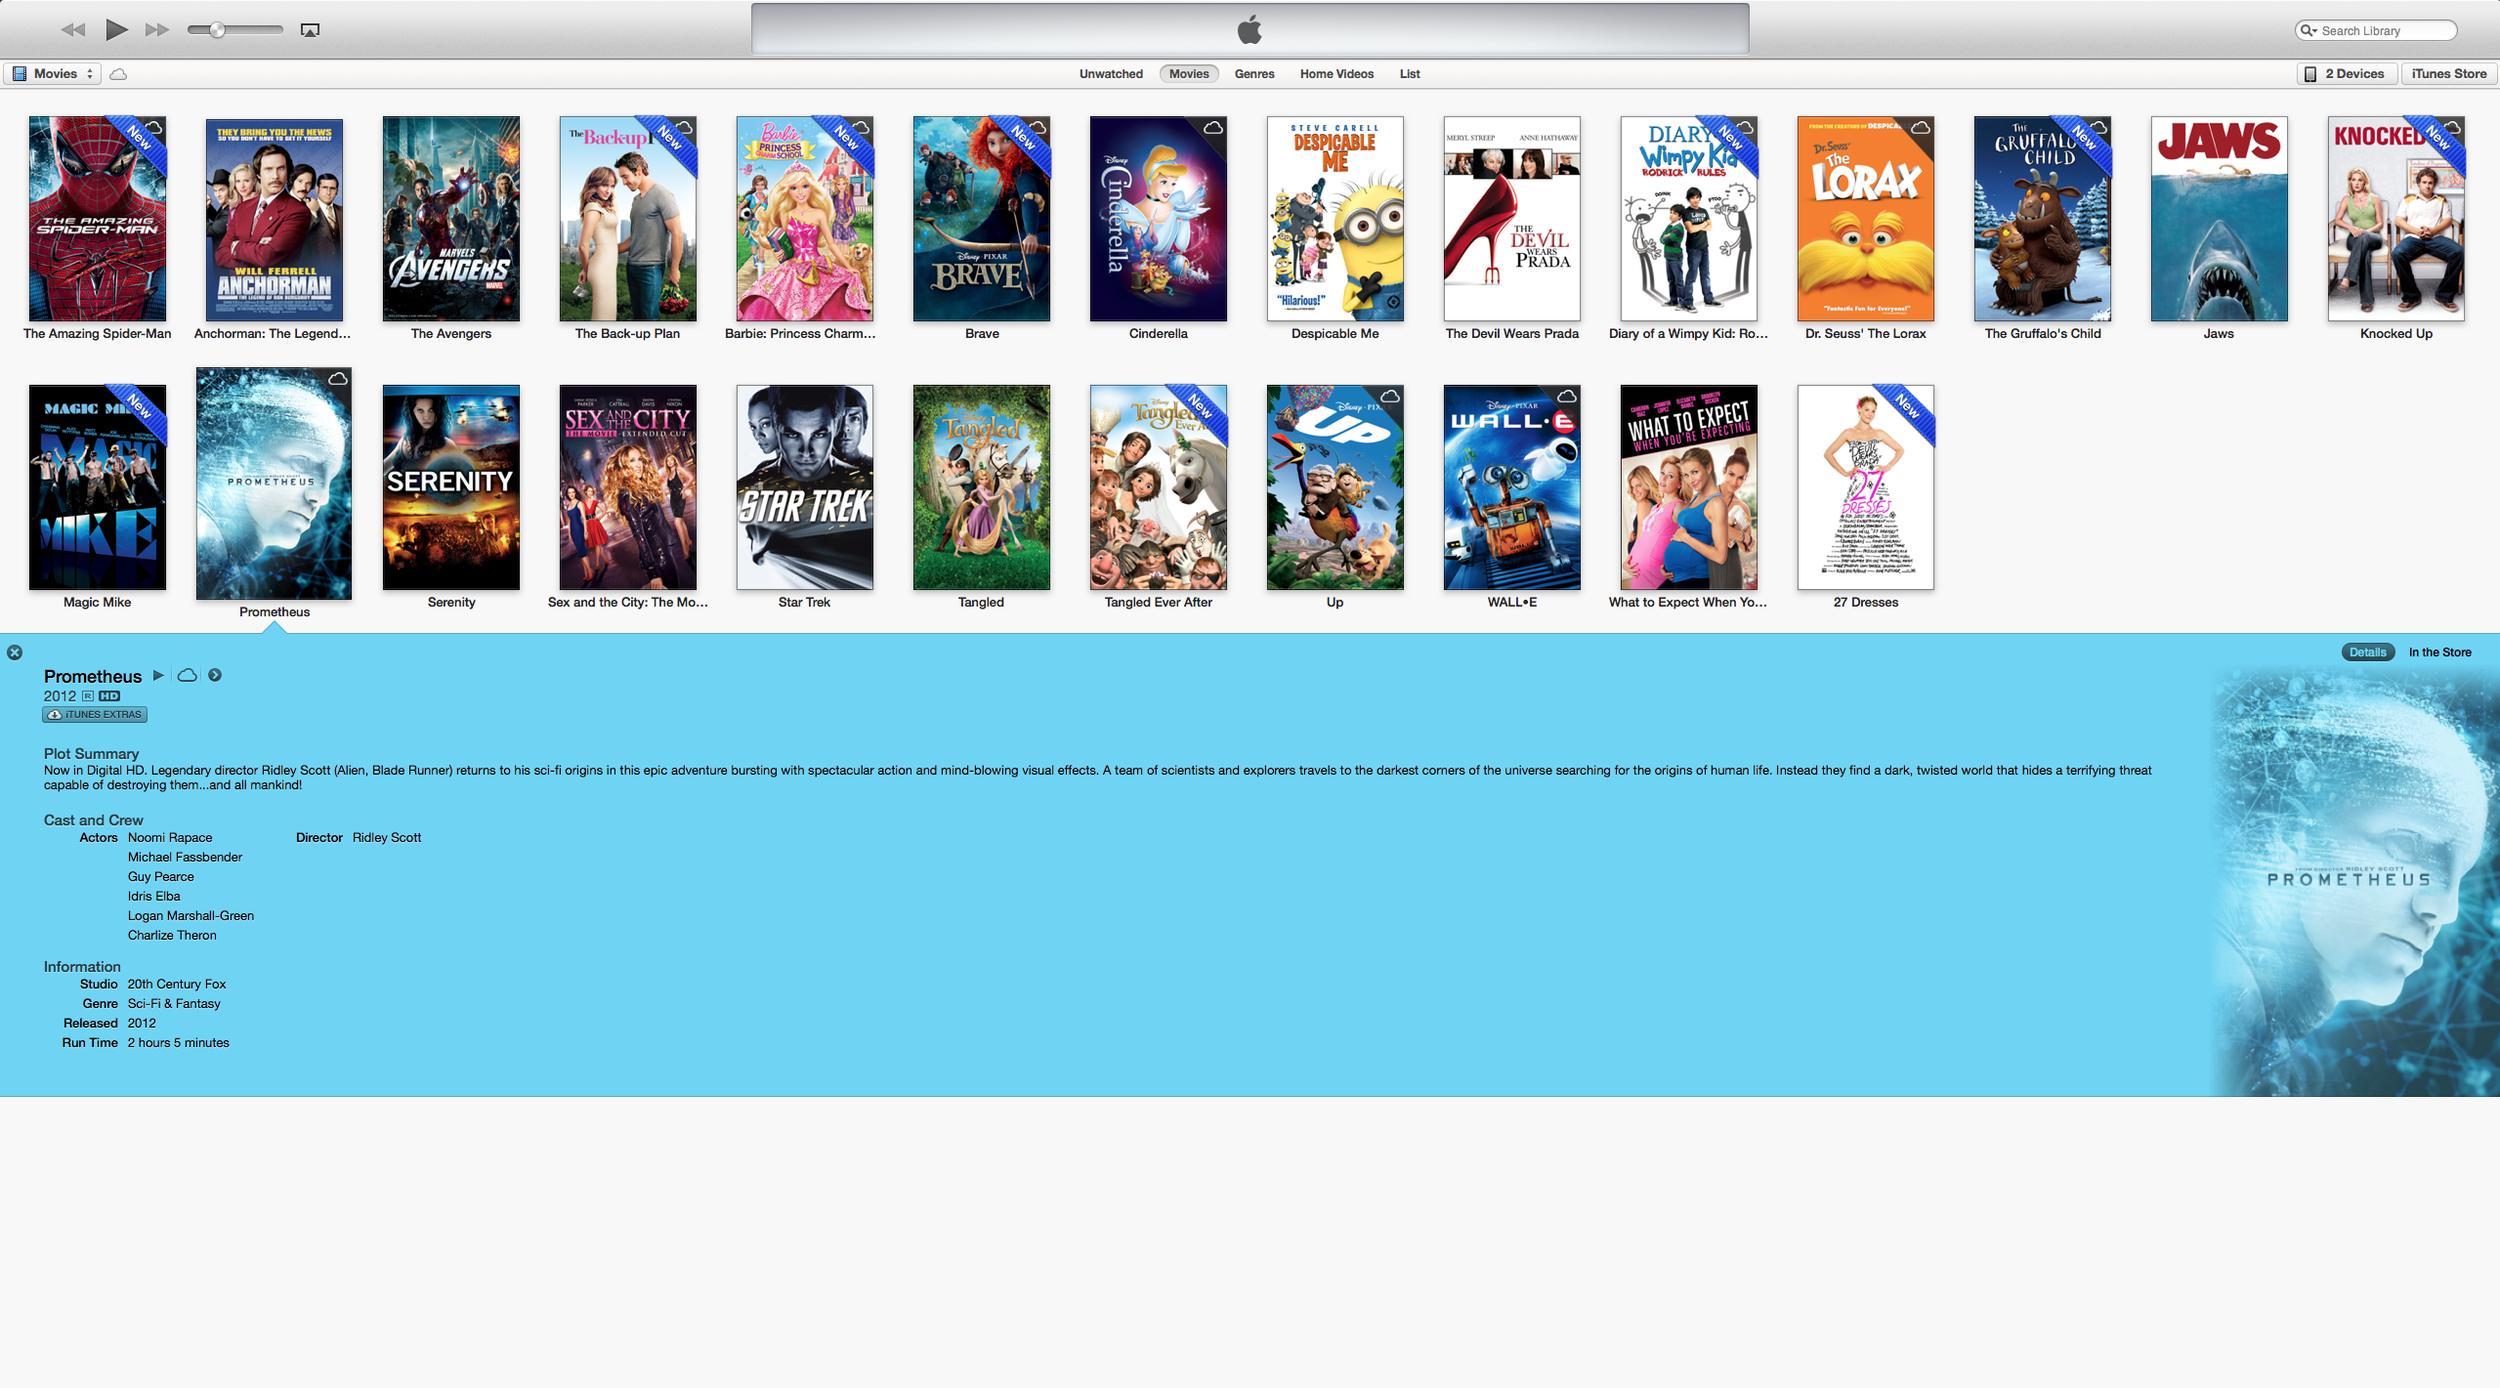 iTunes 11 movie view